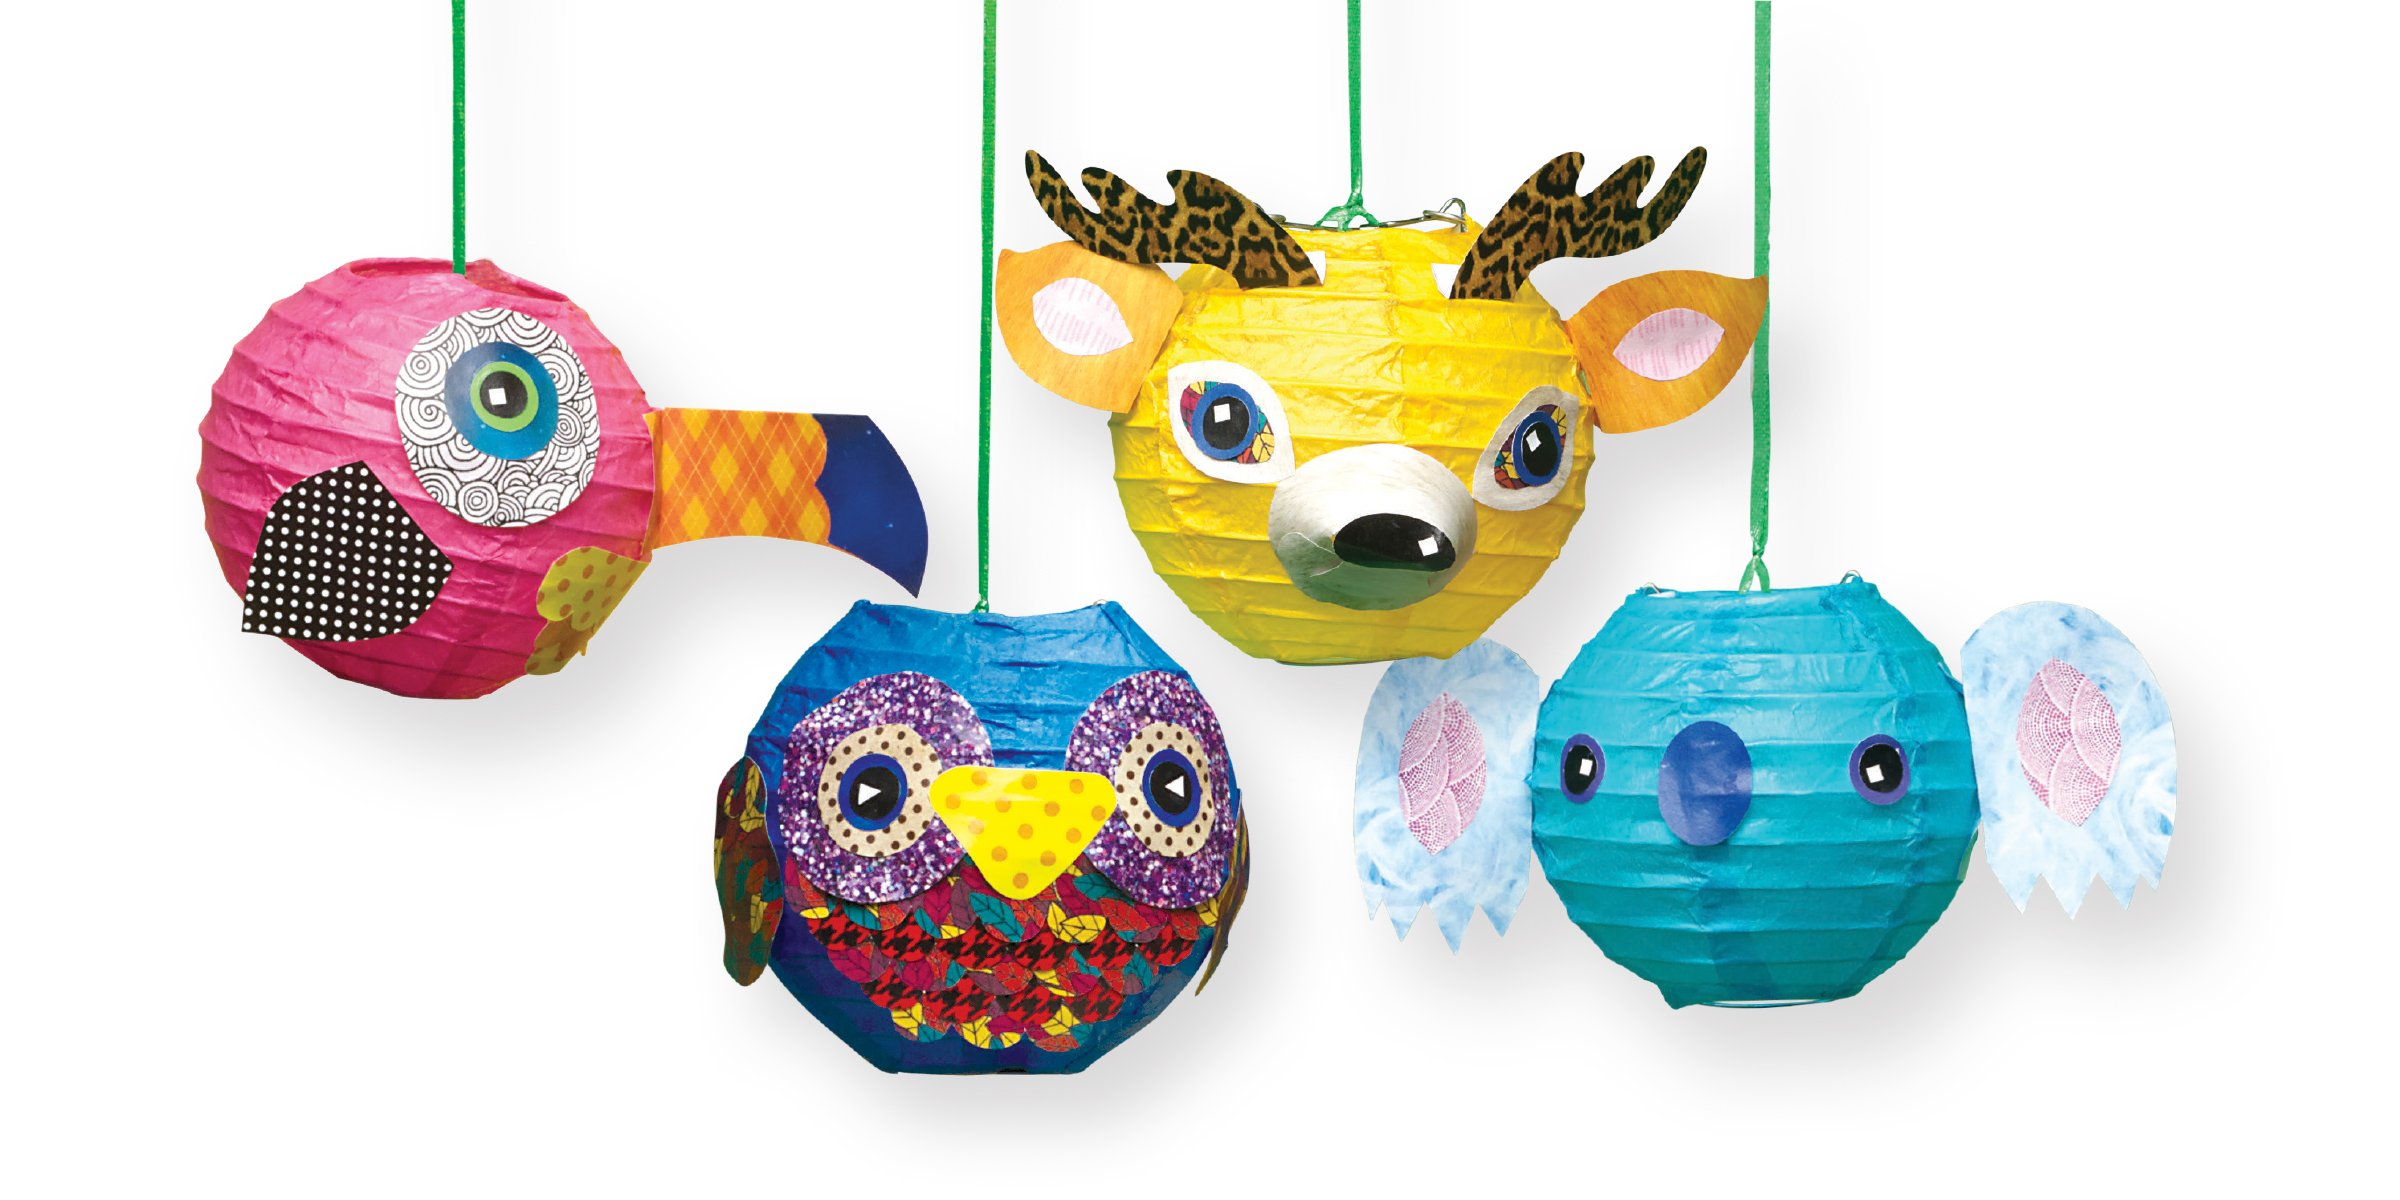 Make Paper Lantern Animals Klutz 9781338037555 Crafts /& Hobbies Novelty /& Activity  Books Holiday Gifts